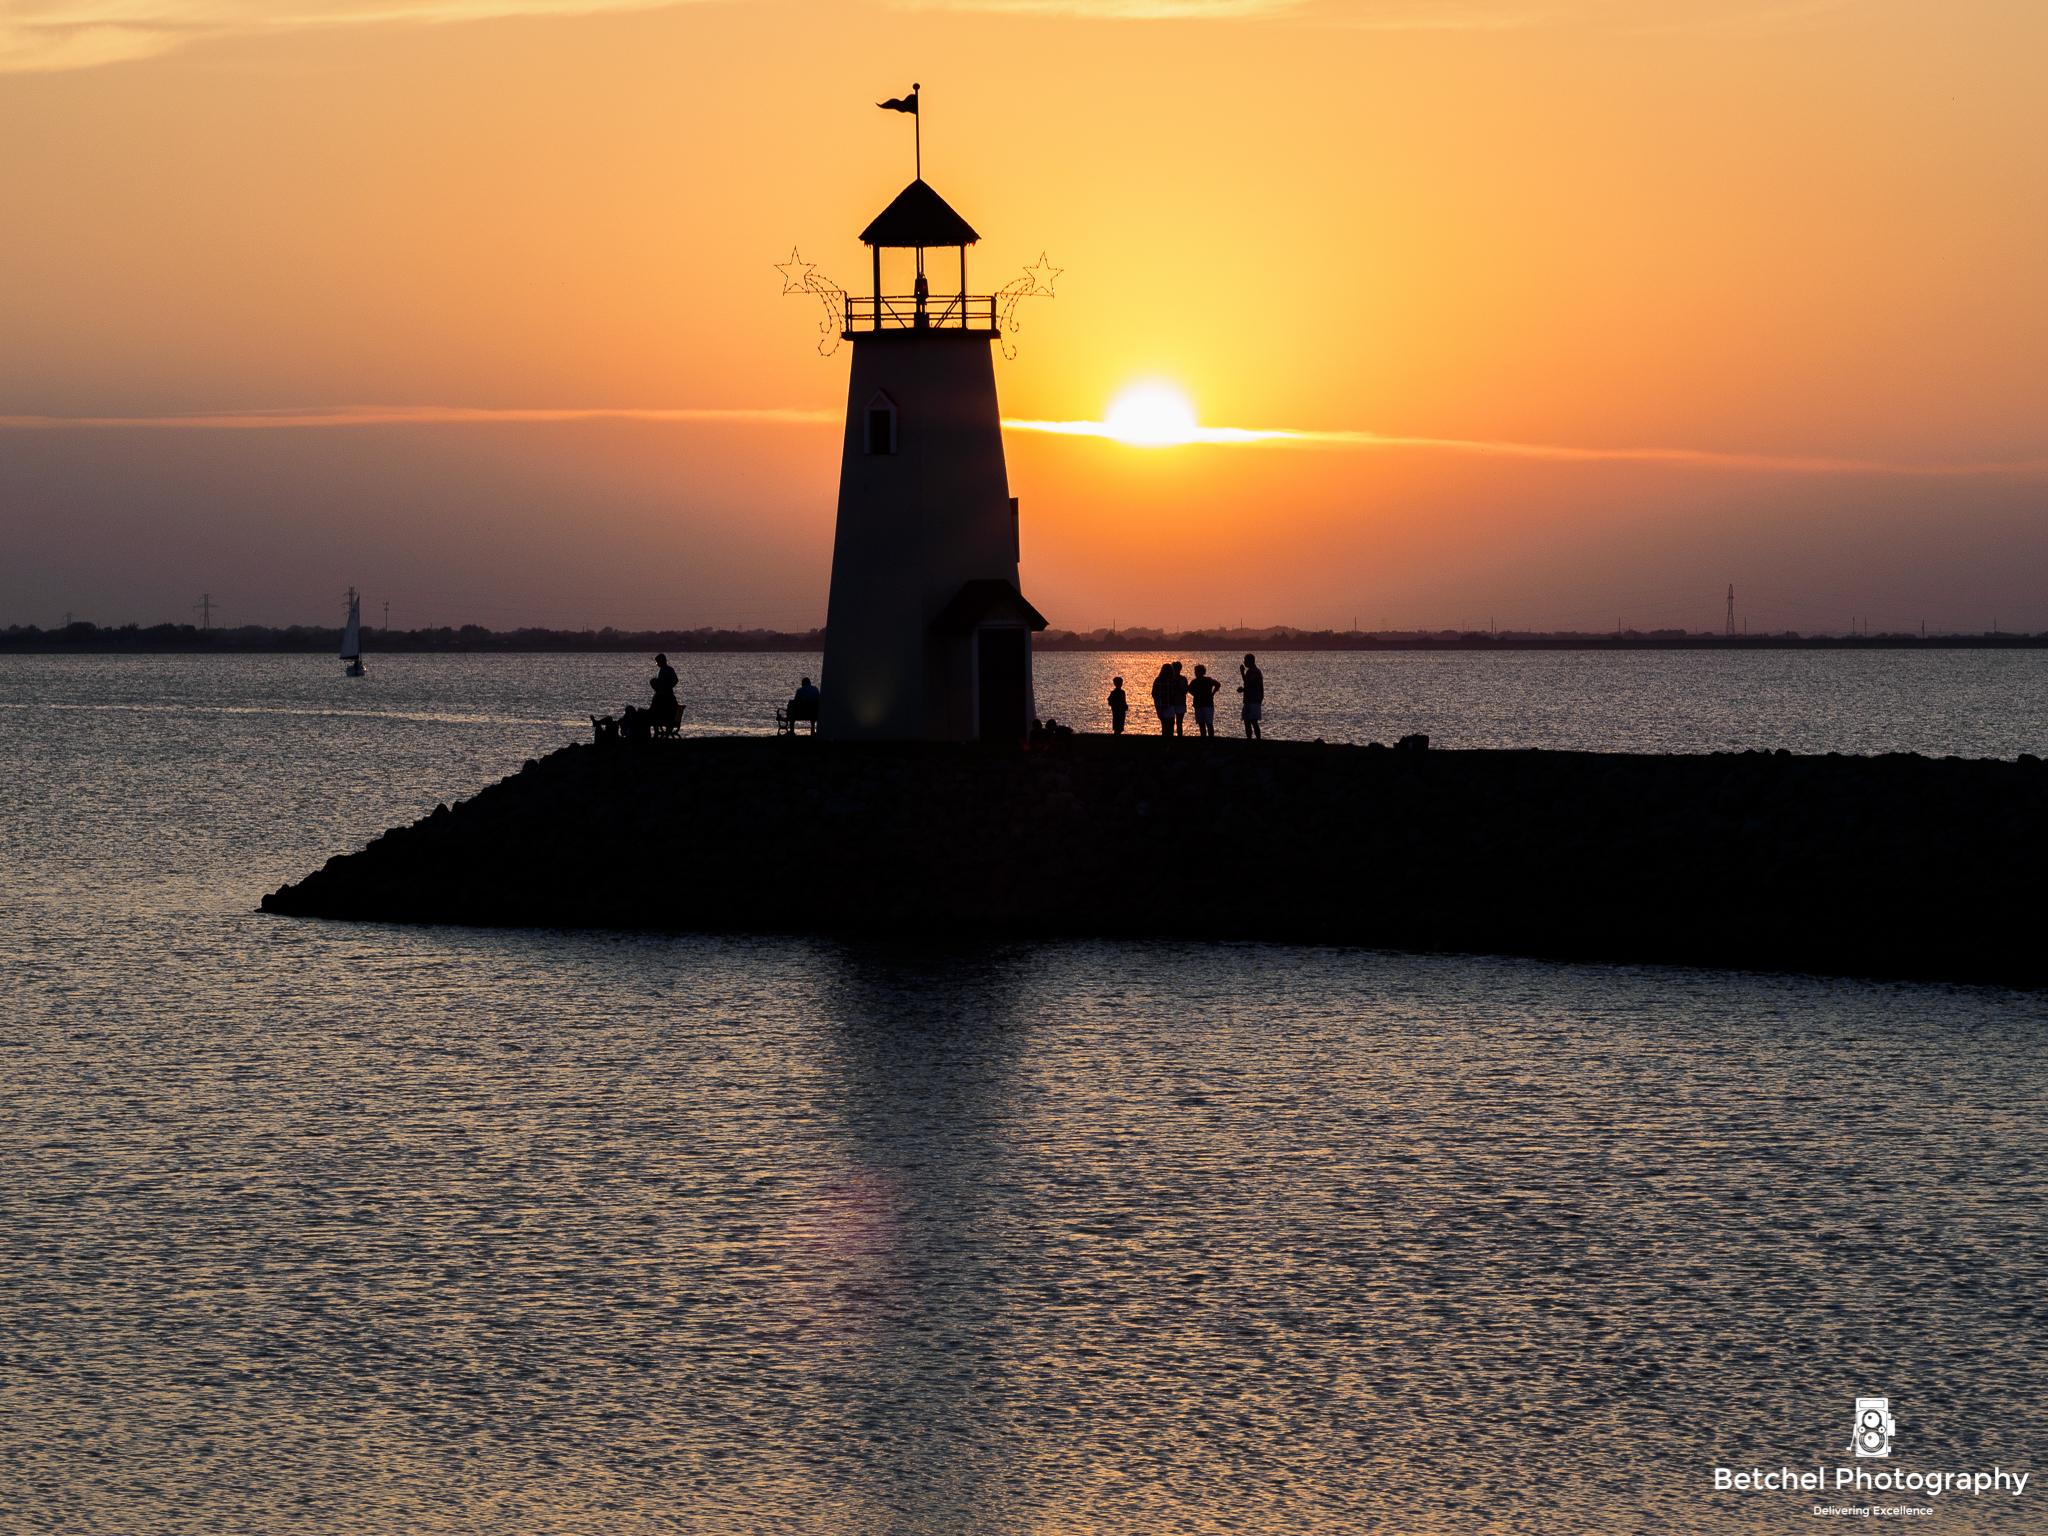 Lake Hefner lighthouse at sunset. Photo by Betchel Photography of Edmond.